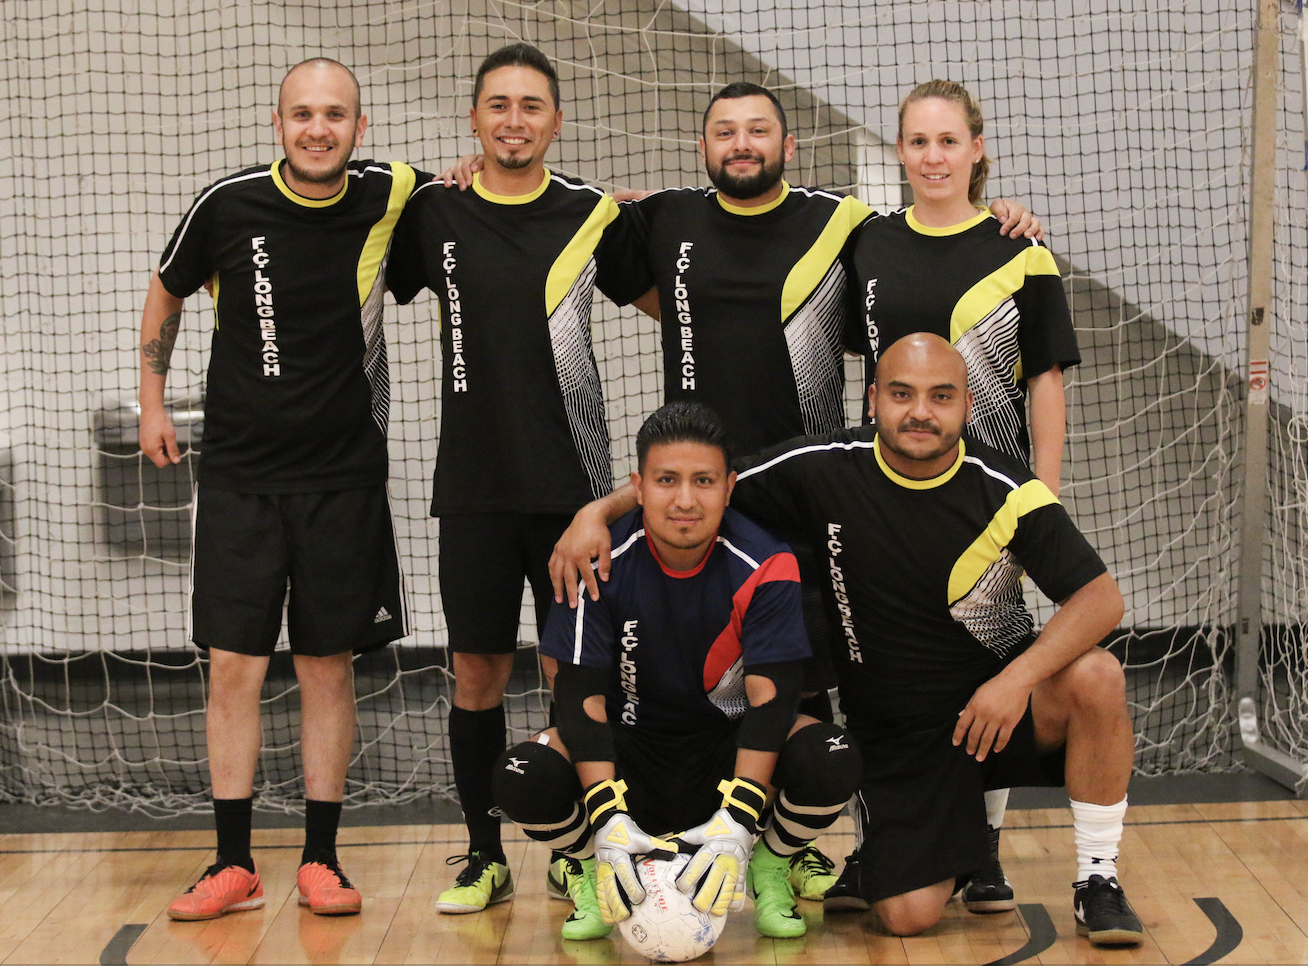 tuesday night 5v5 coed indoor futsal league in garden grove